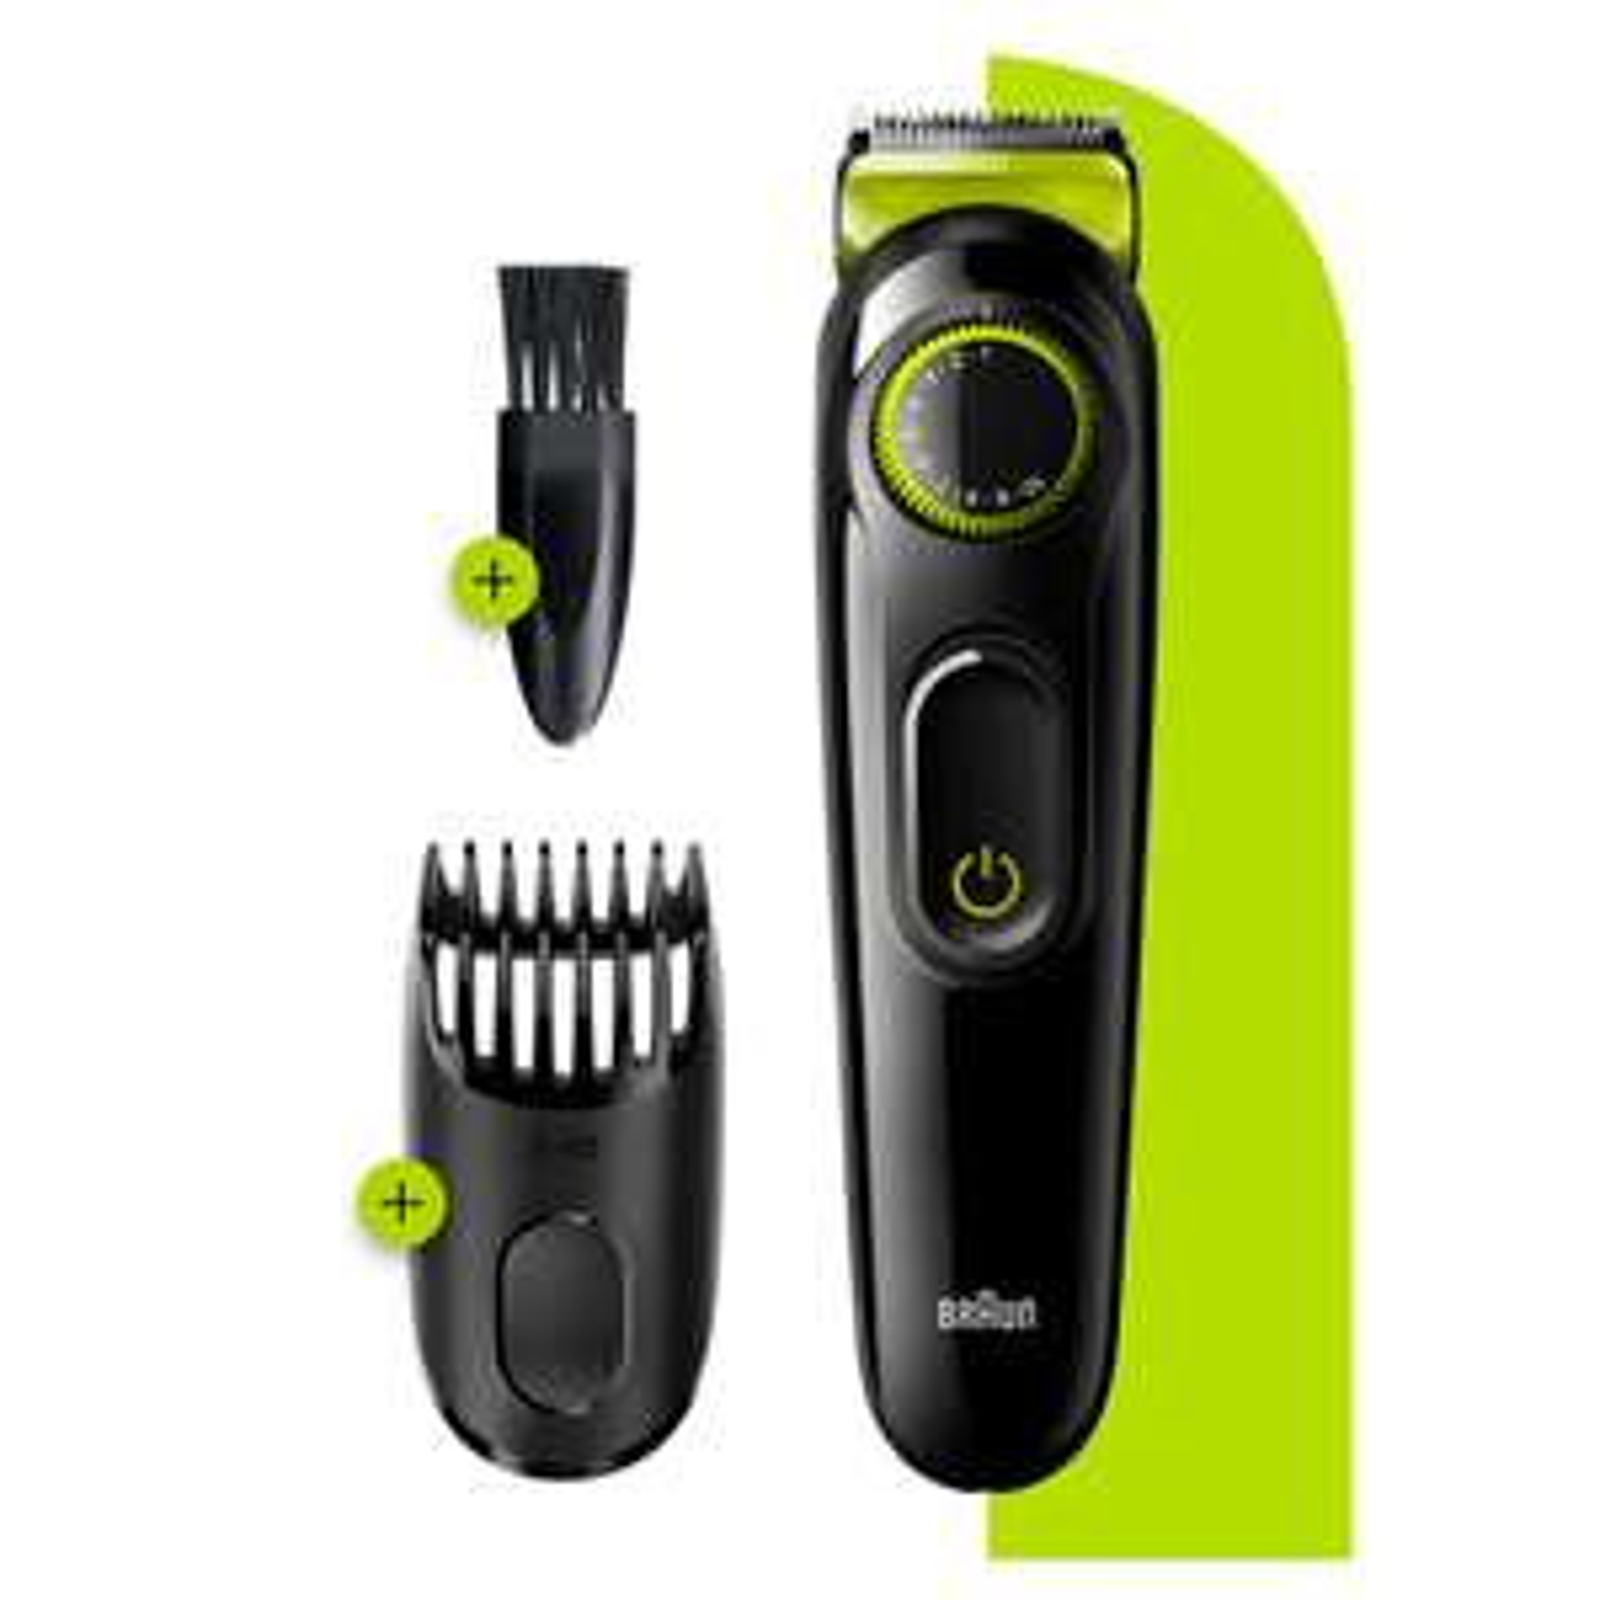 Braun BT3221 Beard Trimmer 0.52p @ Amazon